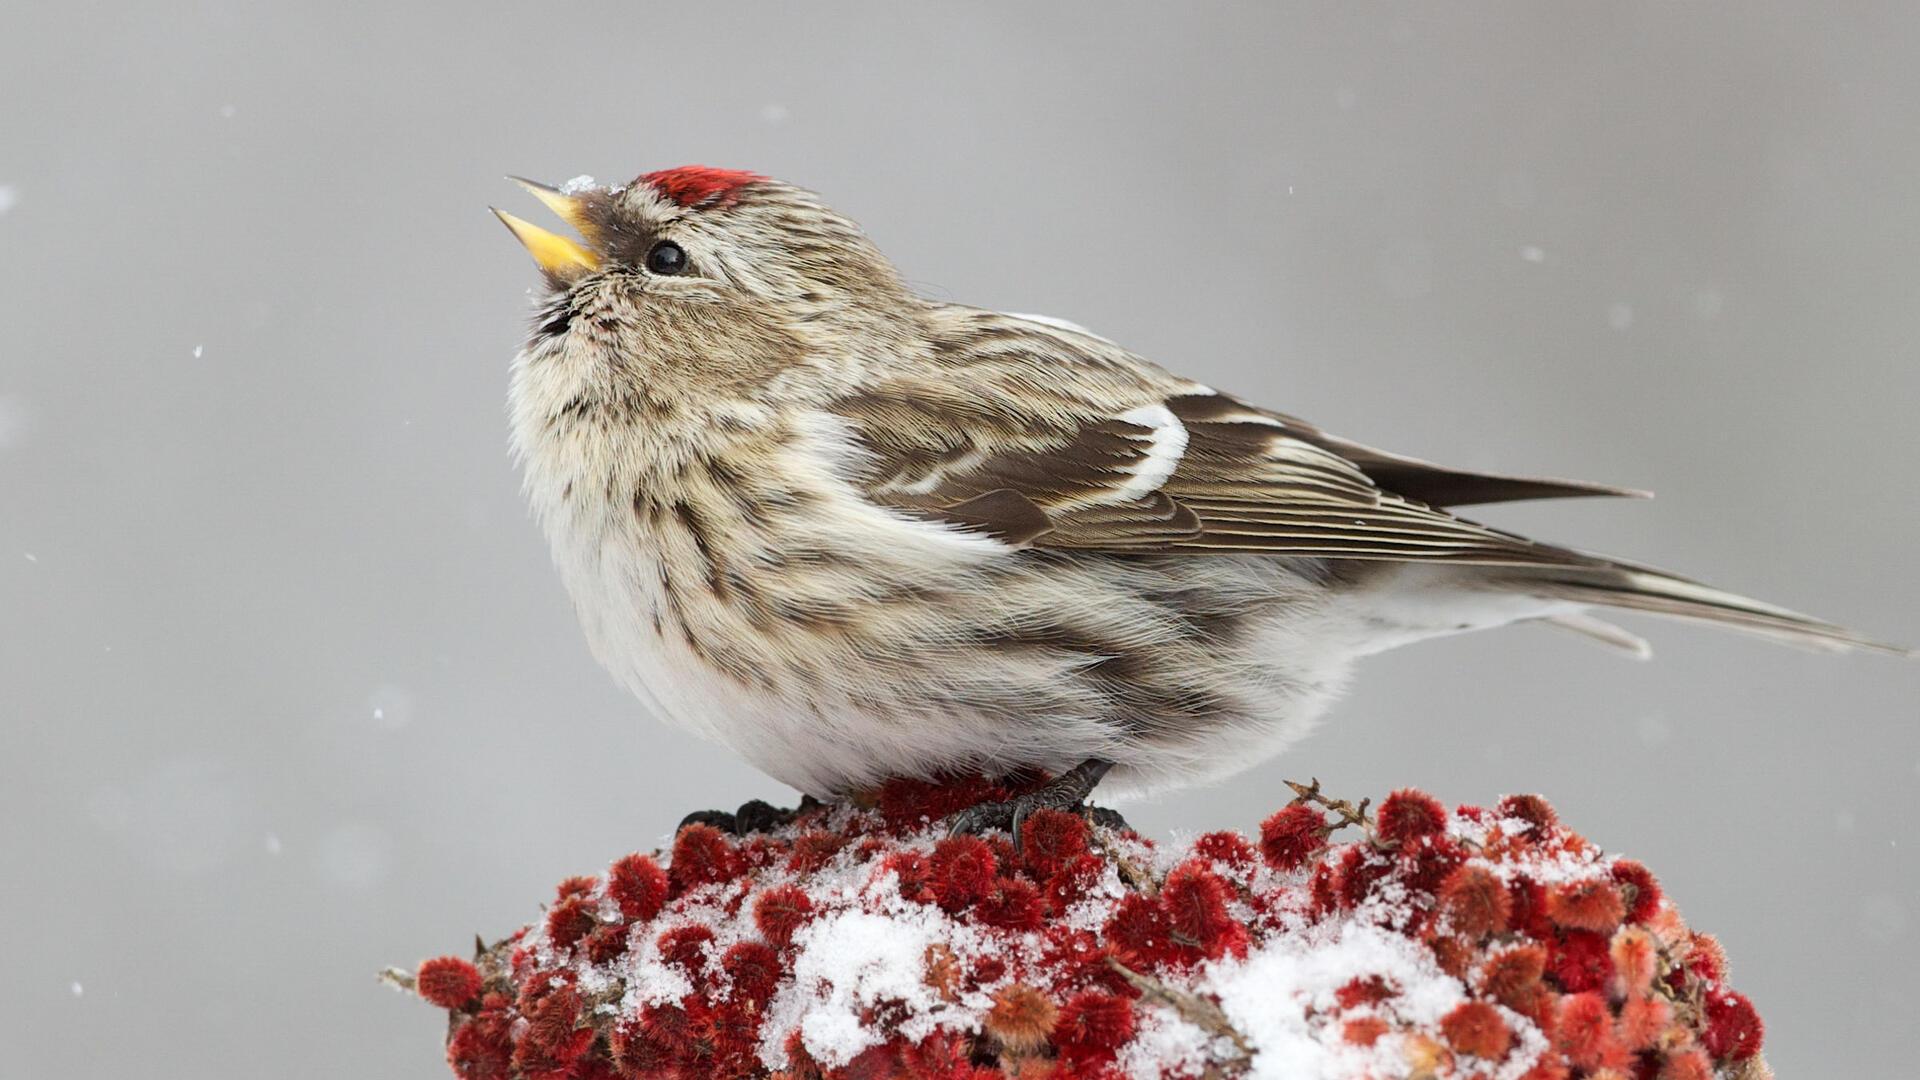 Adult female. Photo: Missy Mandel/Great Backyard Bird Count